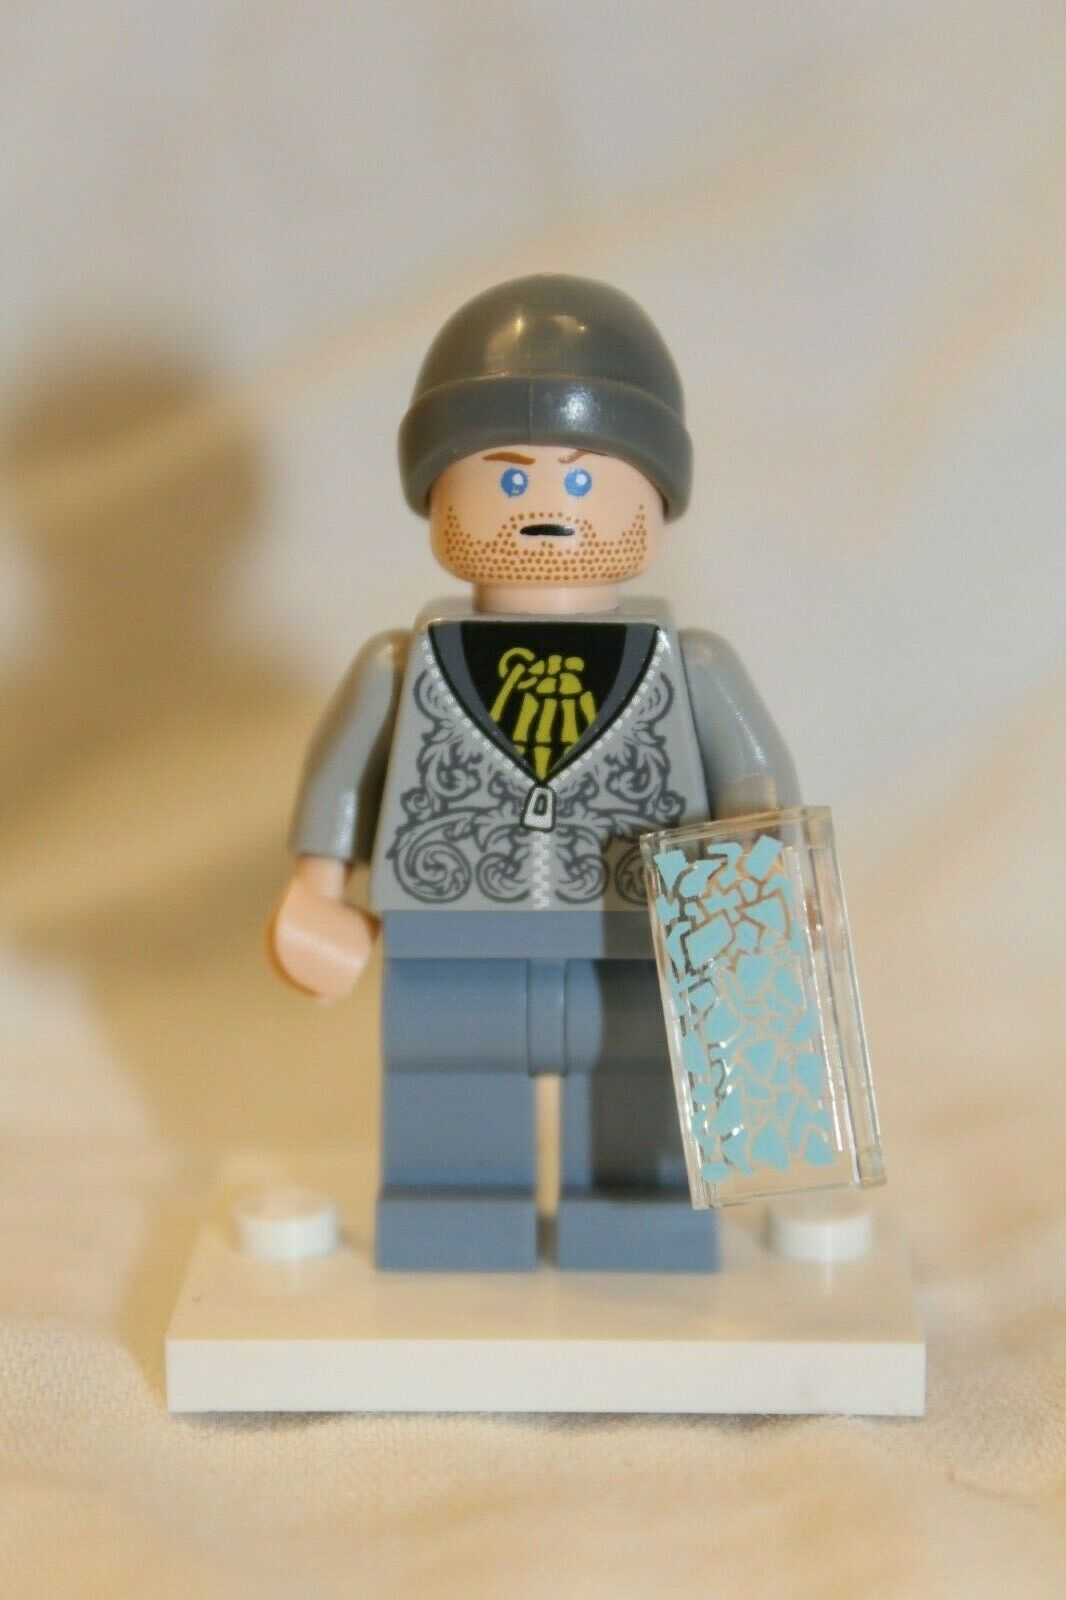 CISCONIAN CISCO CITIZEN BRICK LEGO MINIFIG SOLD OUT